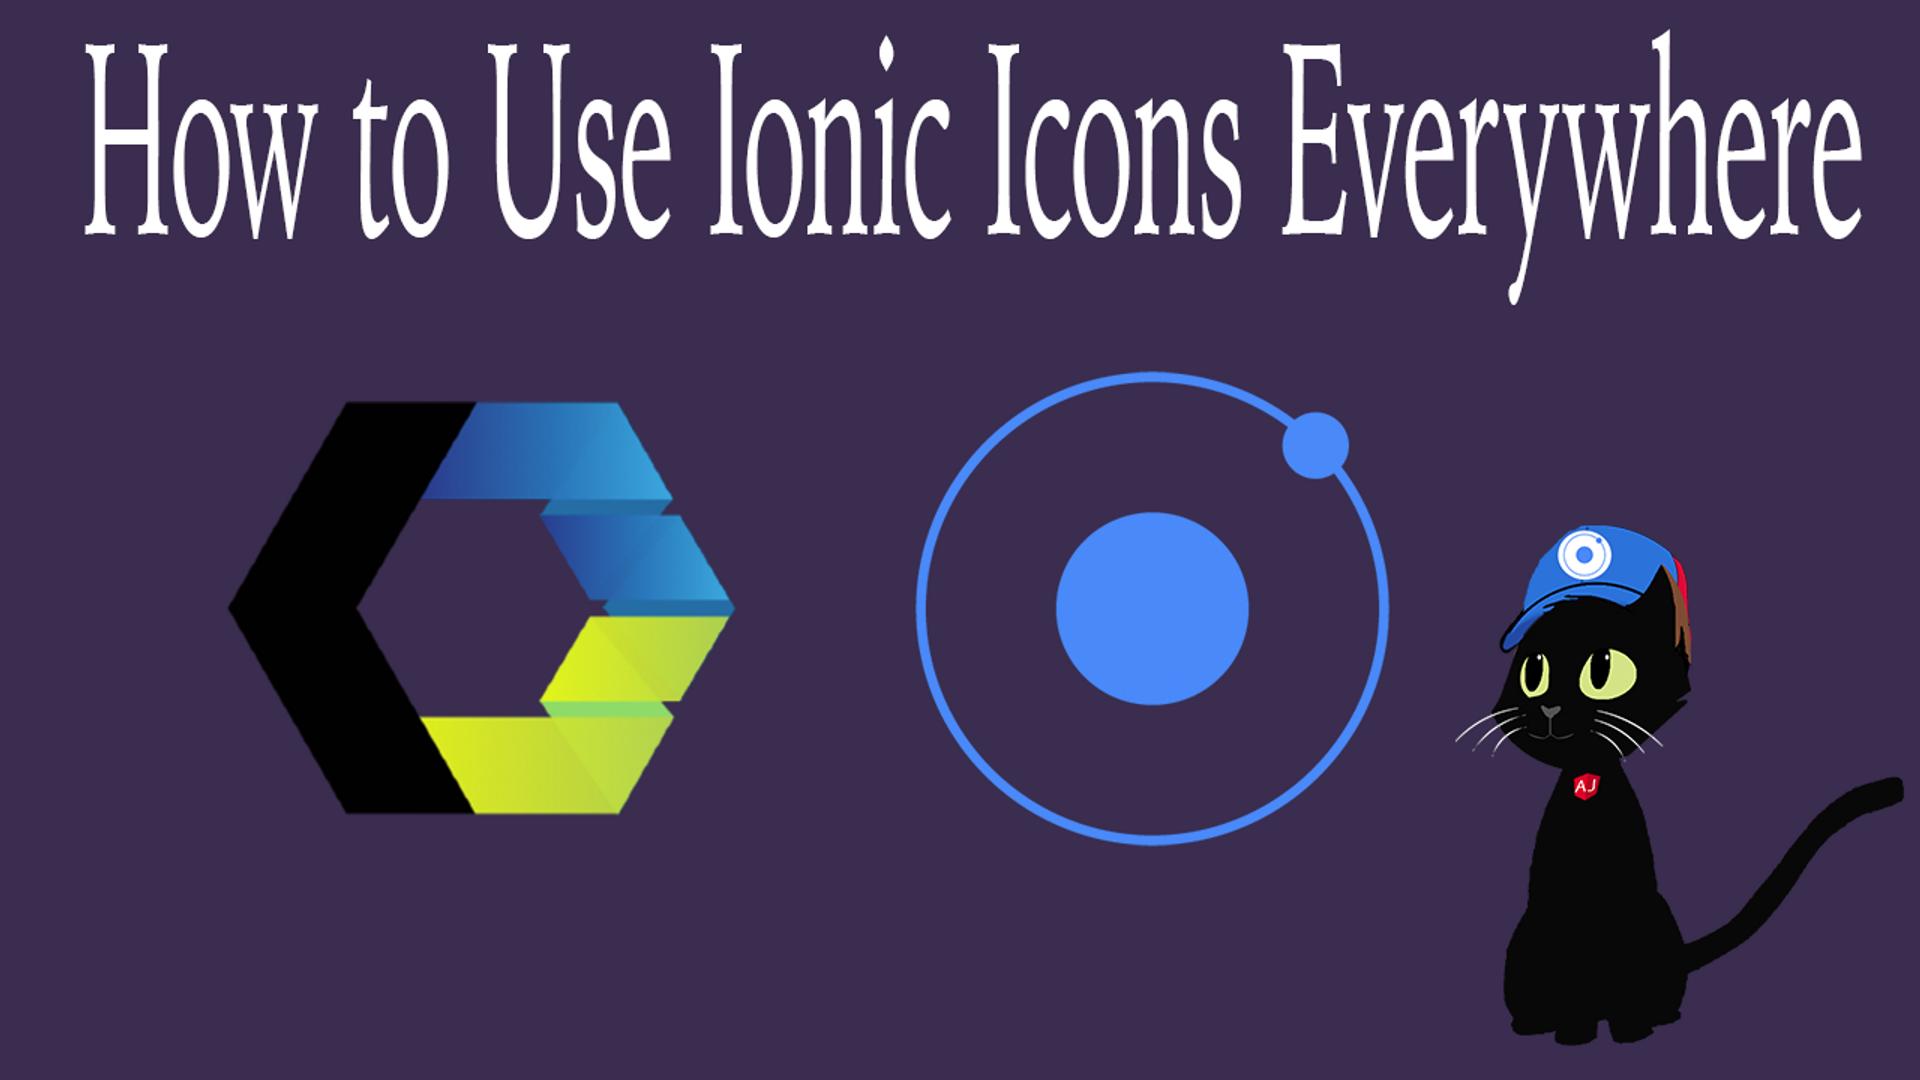 Ionic Icons